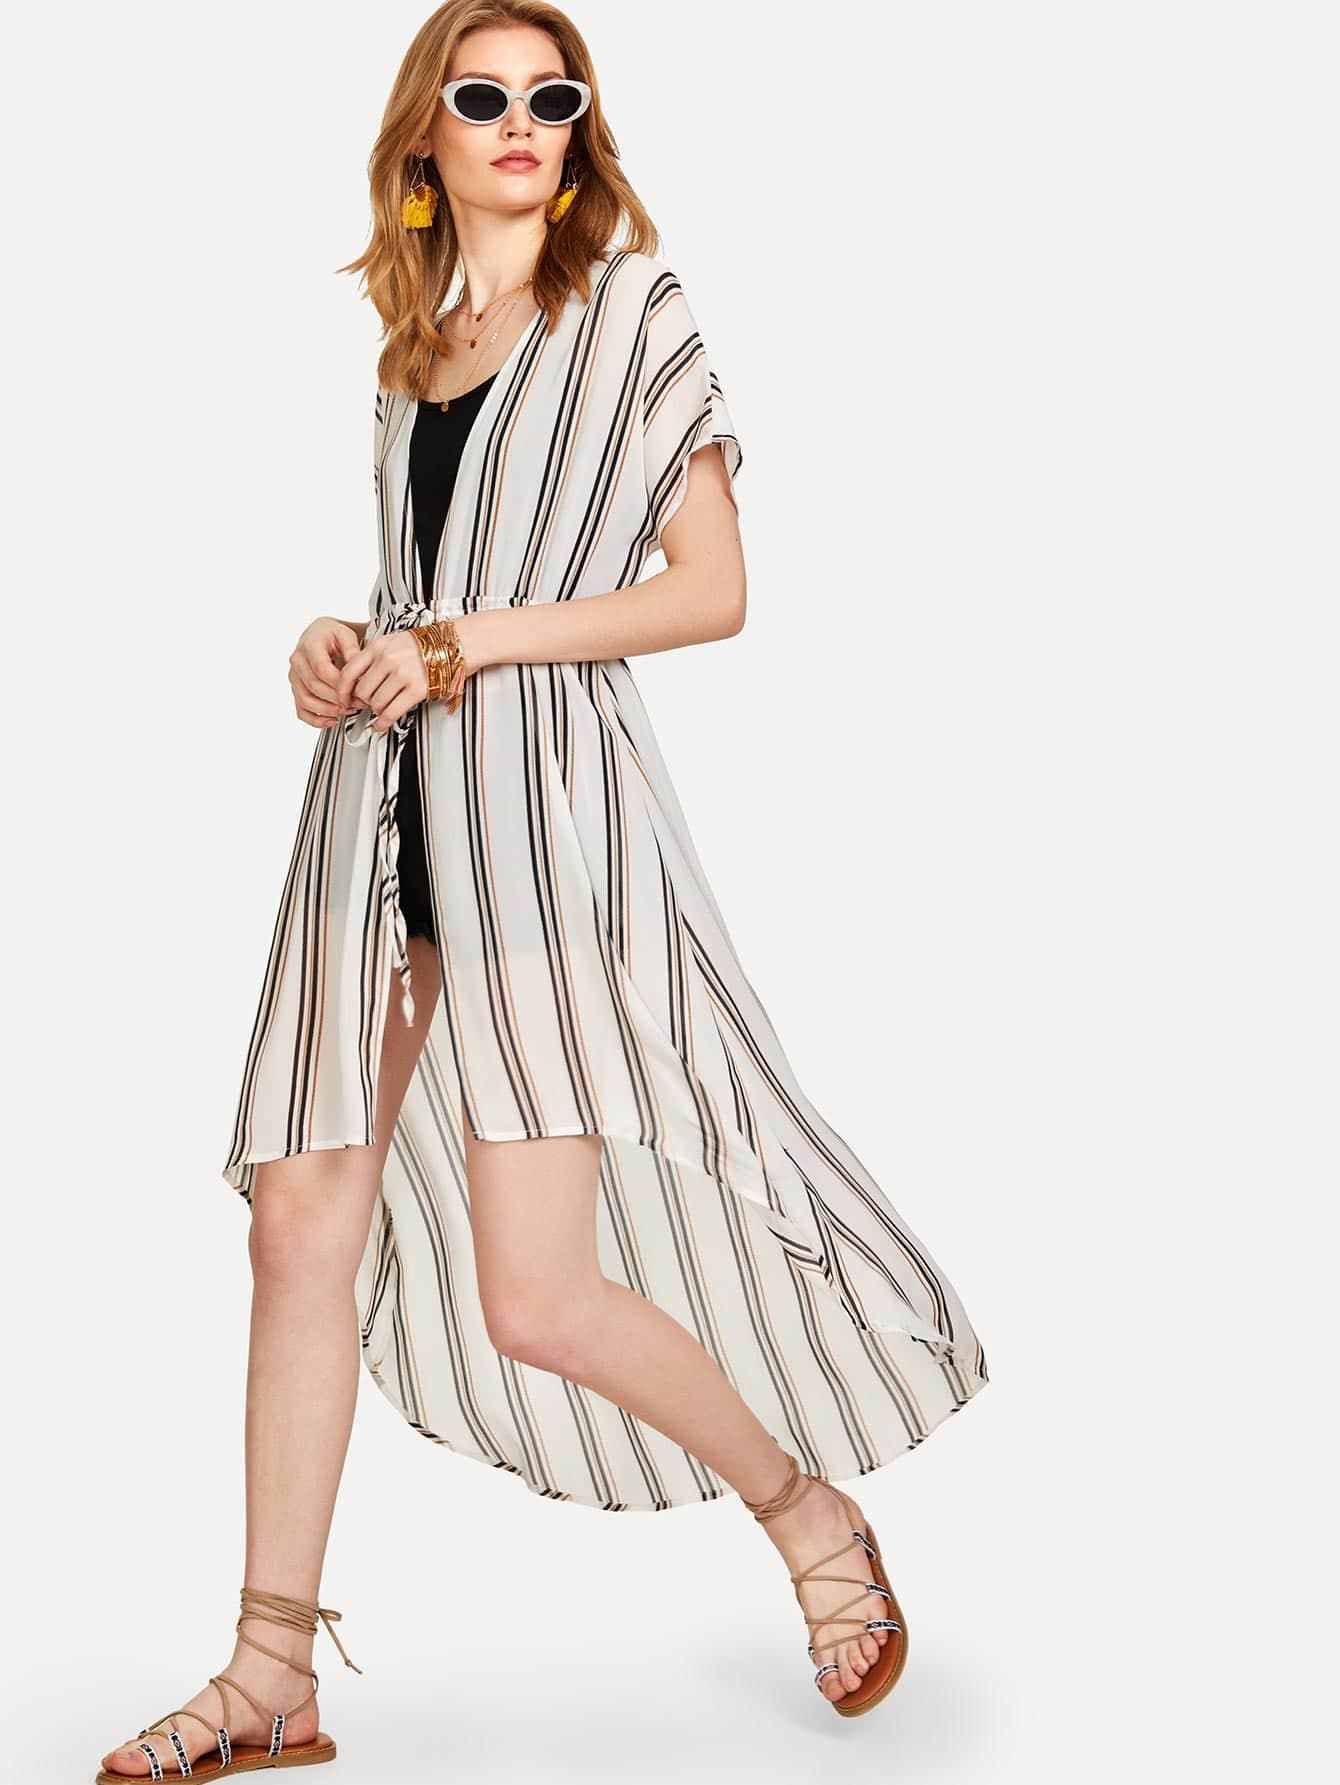 Drawstring Waist High Low Striped Kimono drawstring waist high low striped kimono